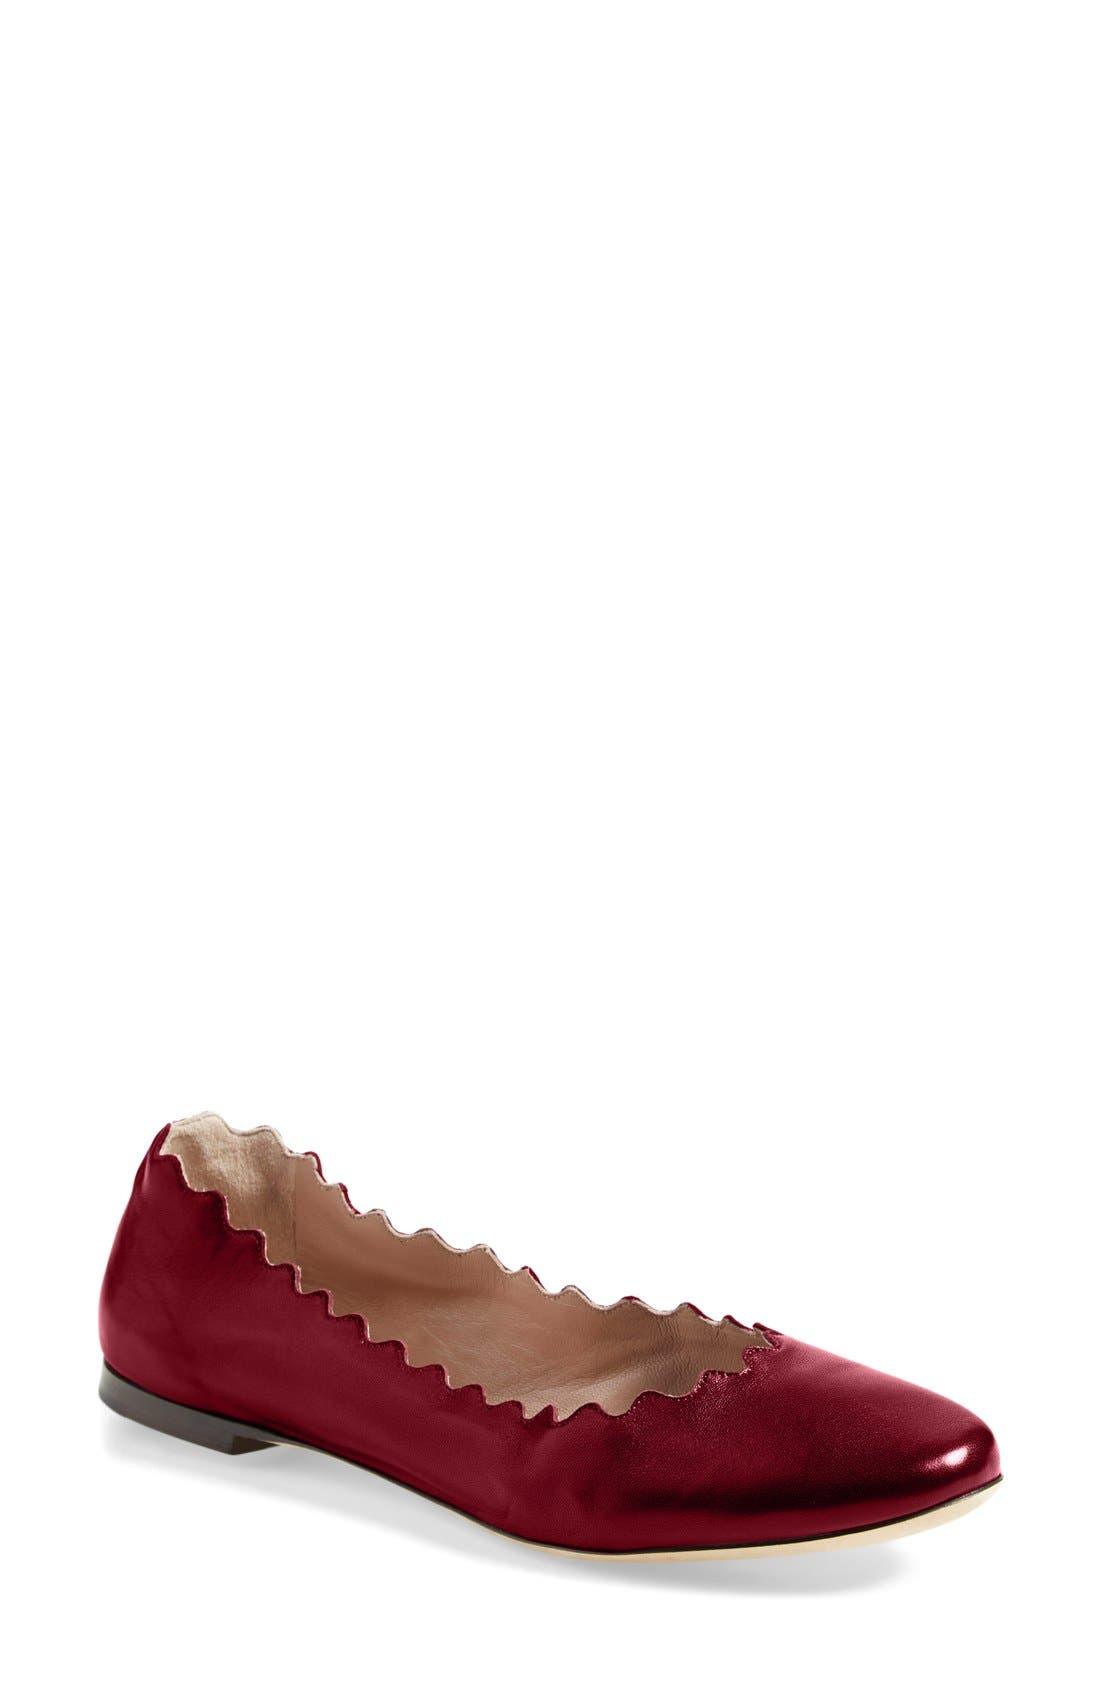 Main Image - Chloé 'Lauren' Scalloped Ballet Flat (Women)